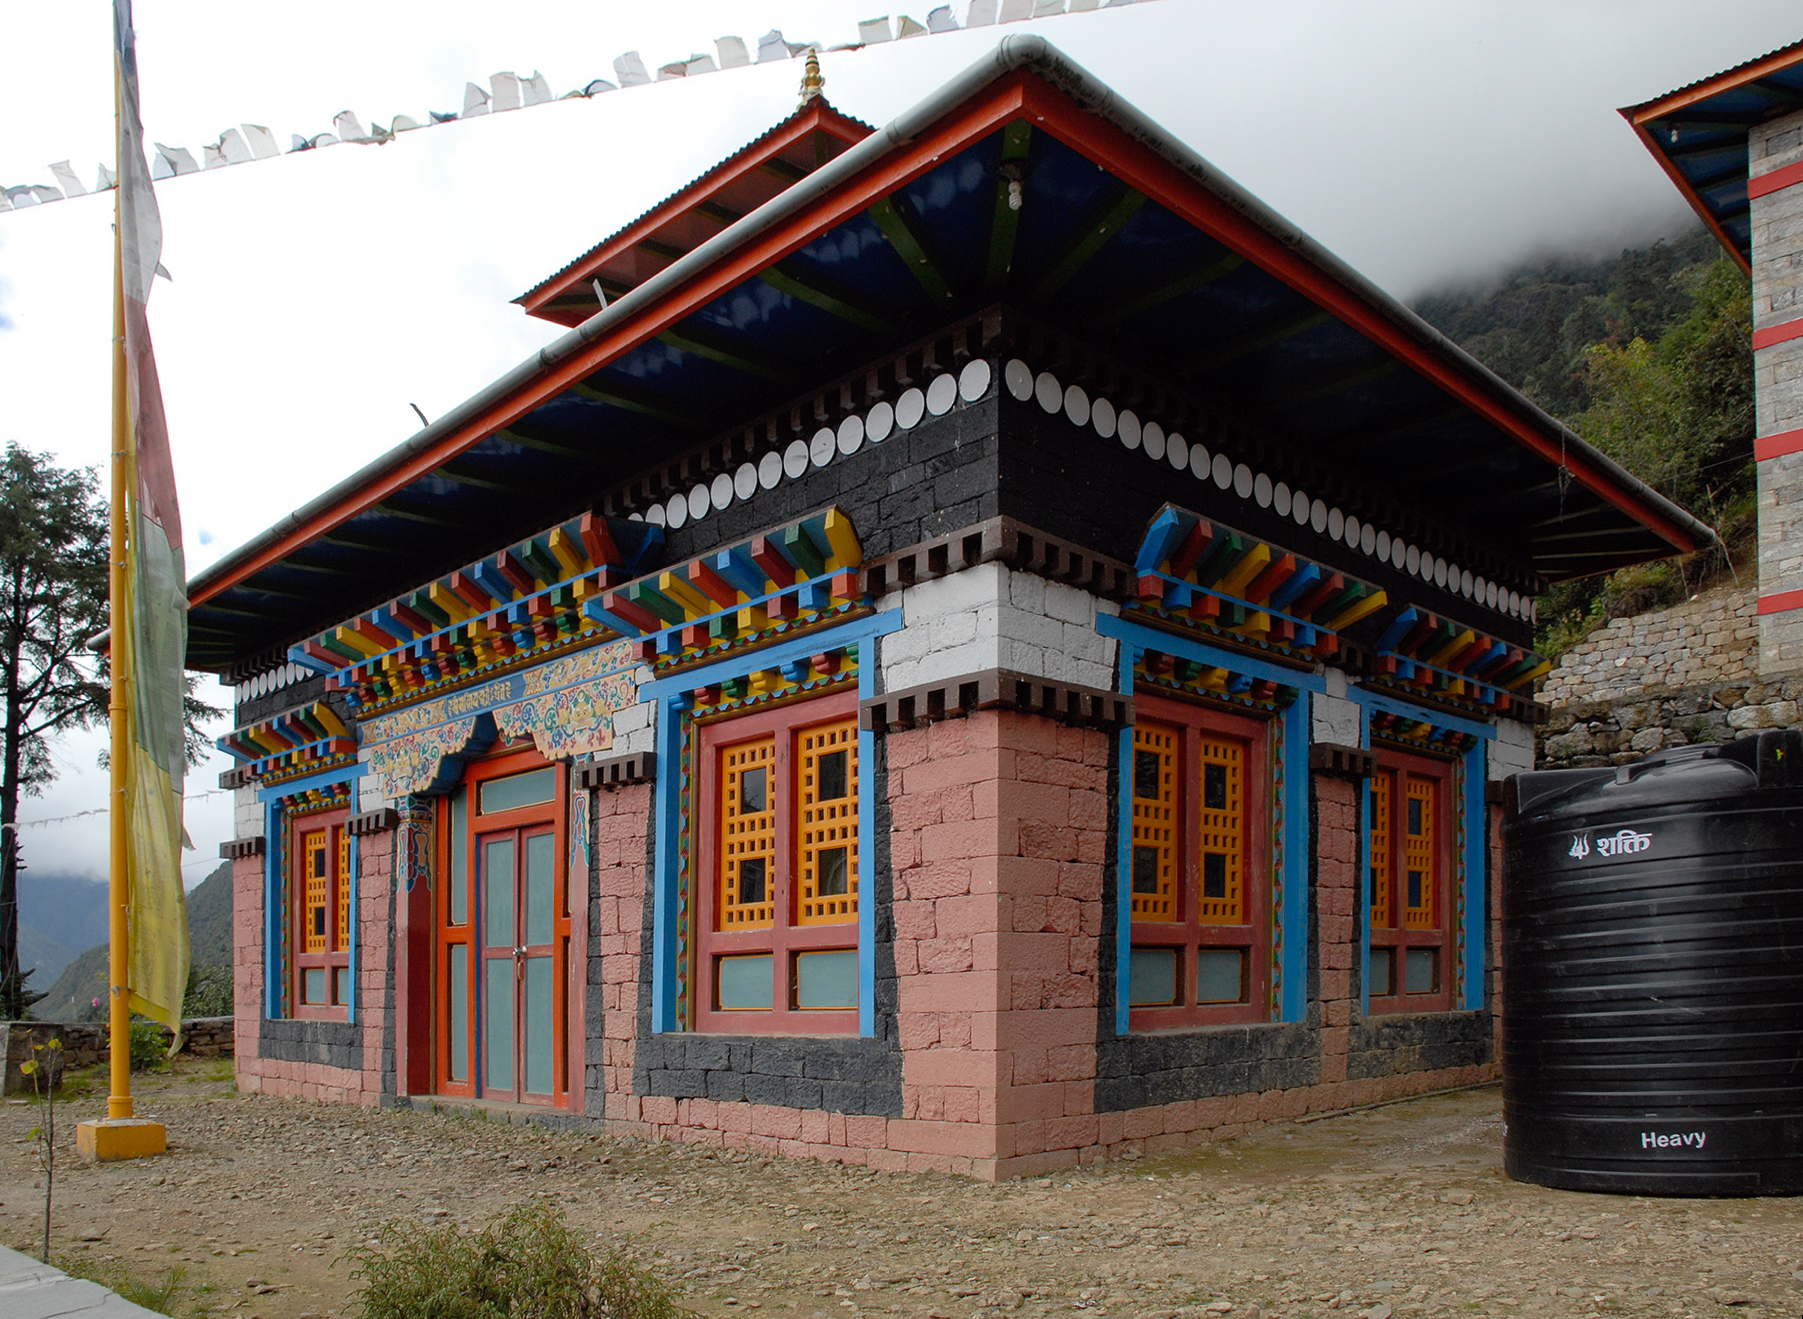 Temple_on_the_outskirts_of_Lukla,_Chaurikharka,_Nepal._-_panoramio.jpg